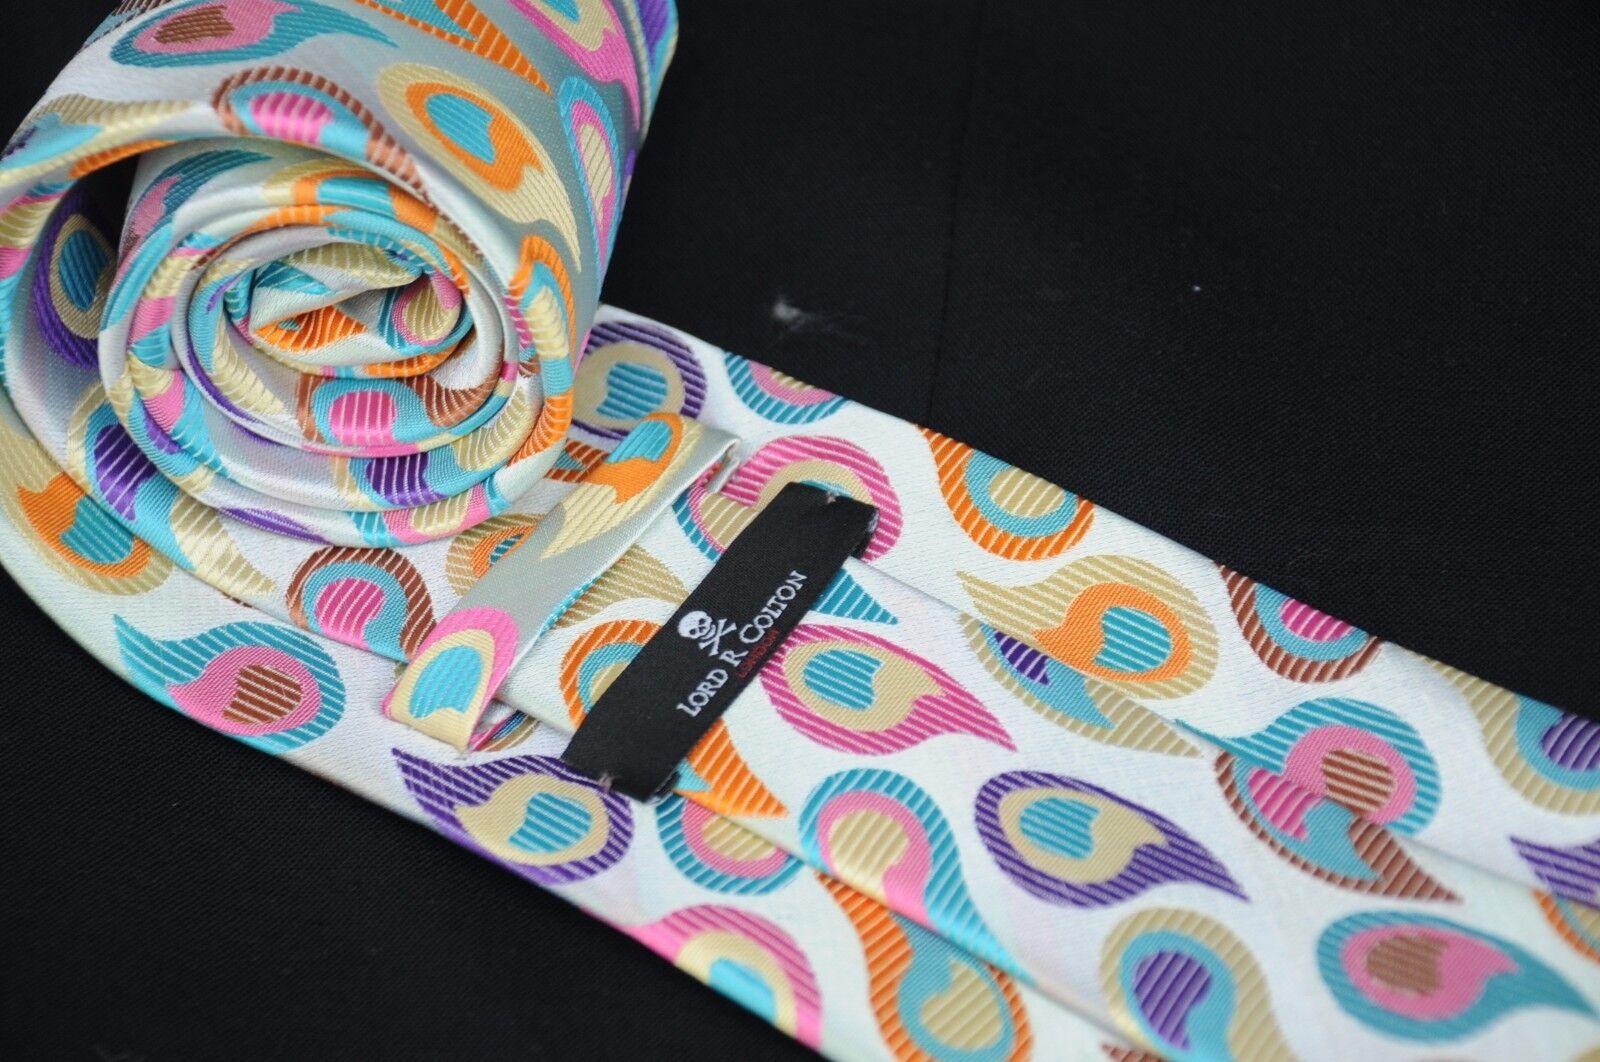 Lord R Colton Masterworks Krawatte - - - Capri Grau Aquamarin Magenta Paisley - Neu   Online-Shop  cc3e72